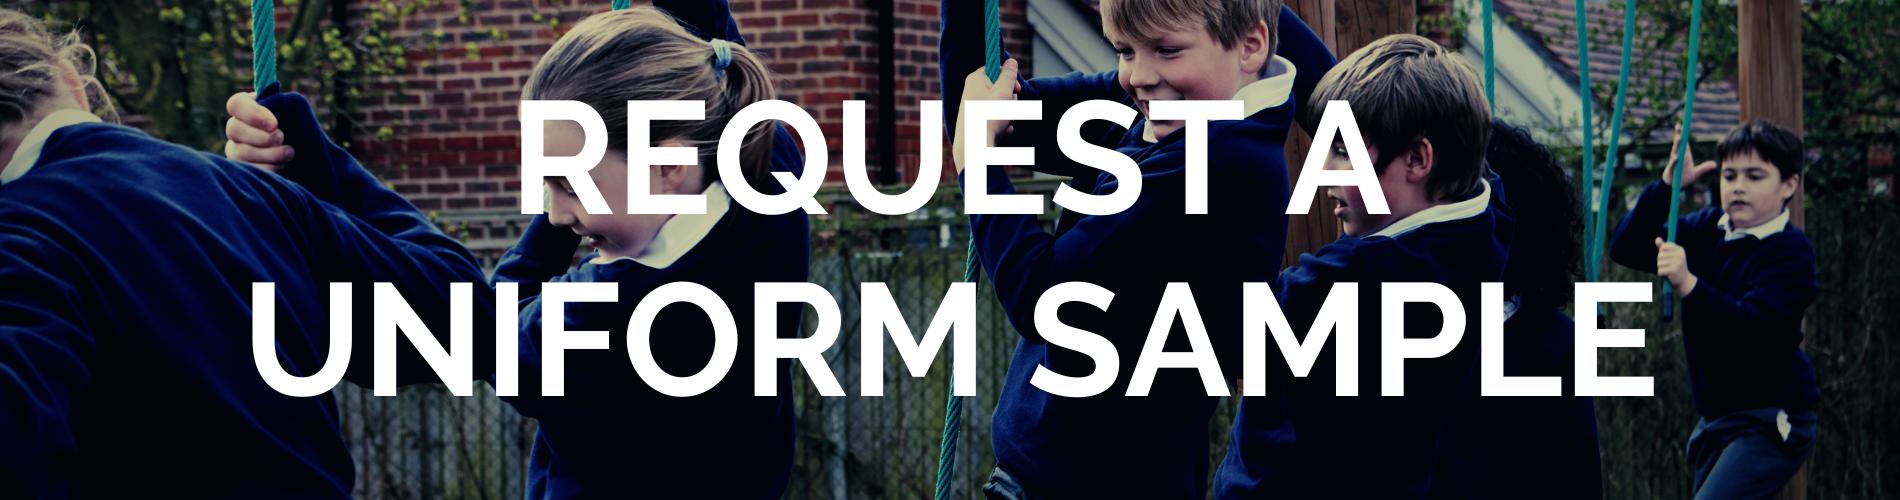 Request a school uniform sample